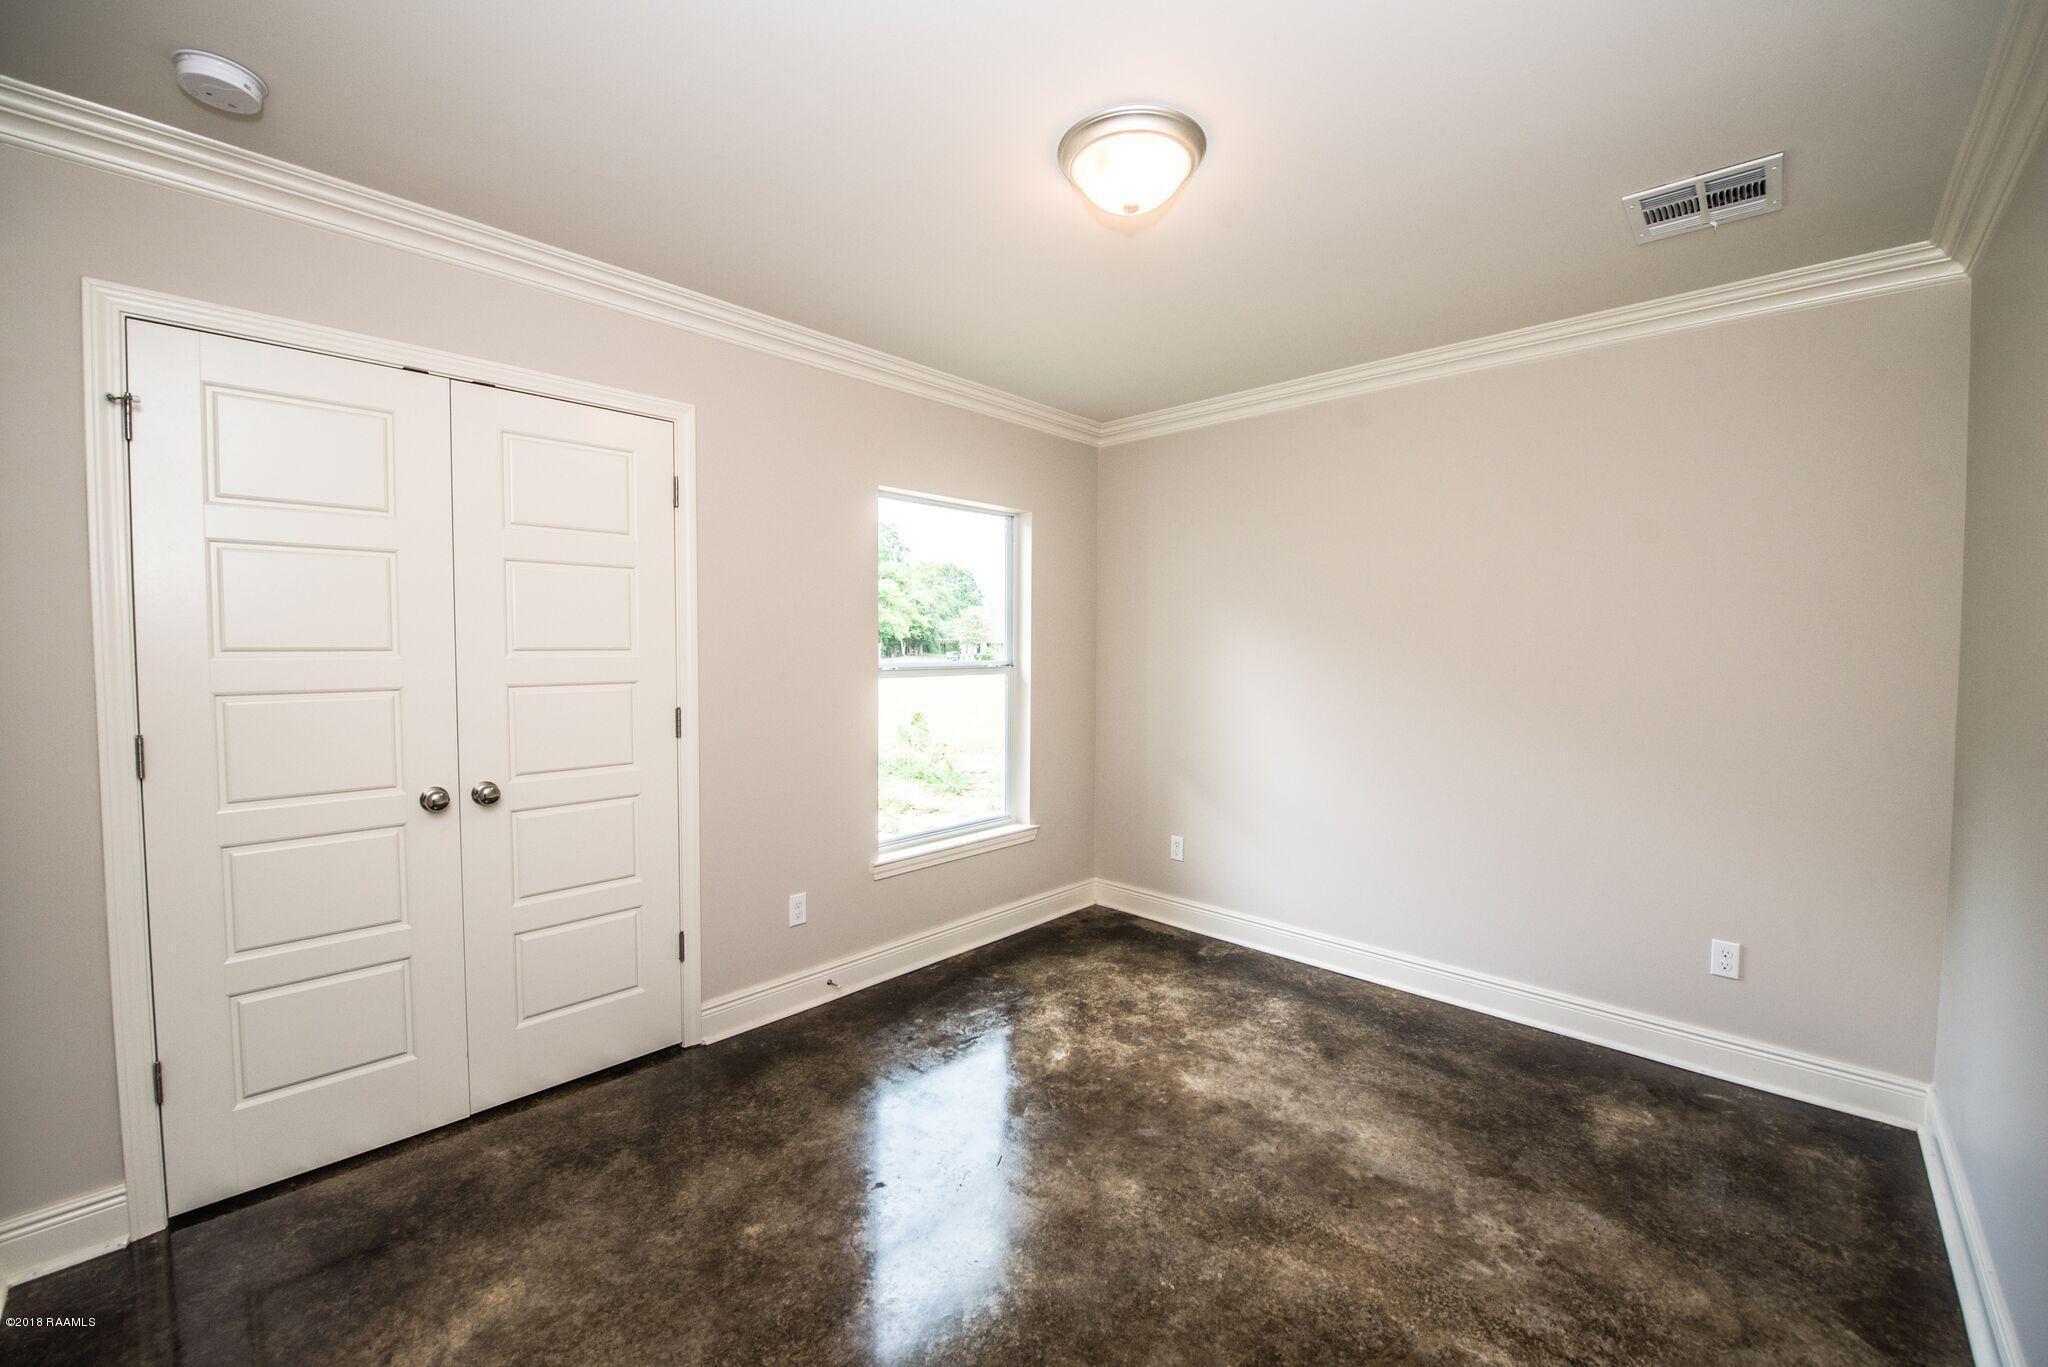 228 Stoneburg, Duson, LA 70529 (MLS# 17012461) - Guidry & Company ...